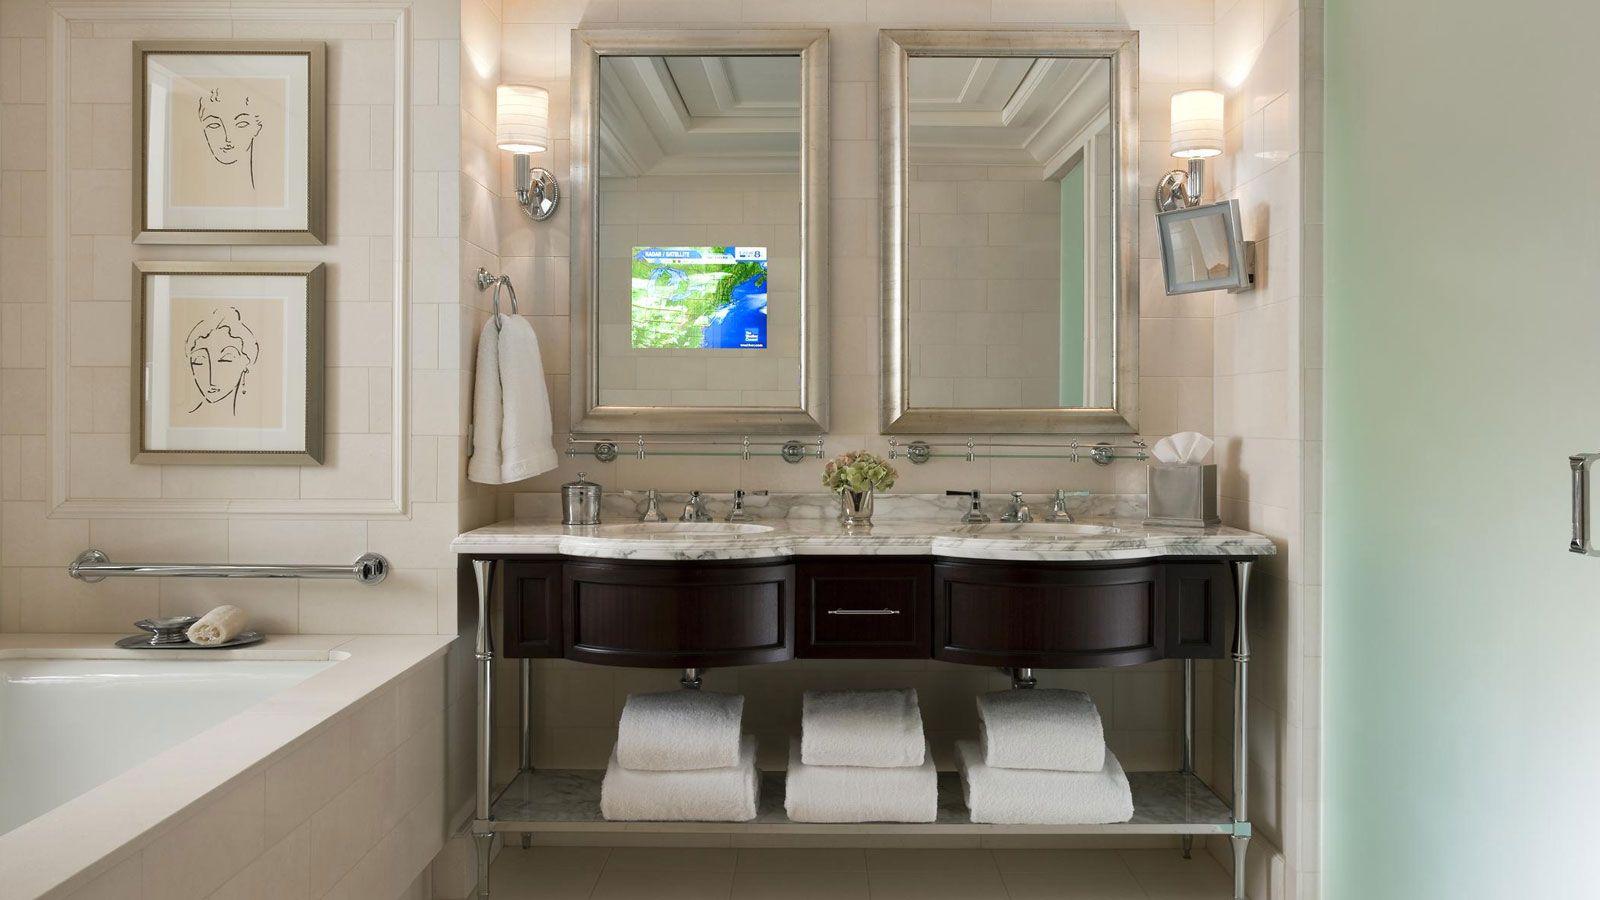 pictures in bath | Atlanta hotels, Luxury bathroom ...